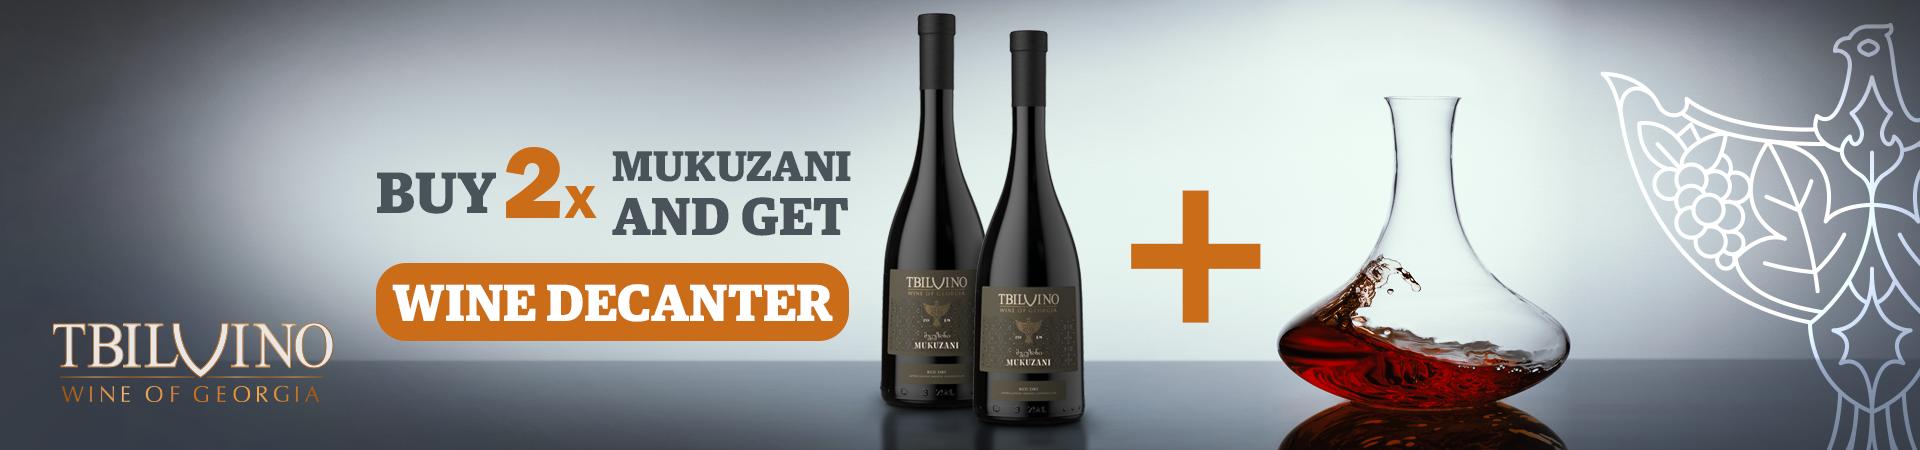 Tbilvino-mukuzani-gift-1920X450-Eng